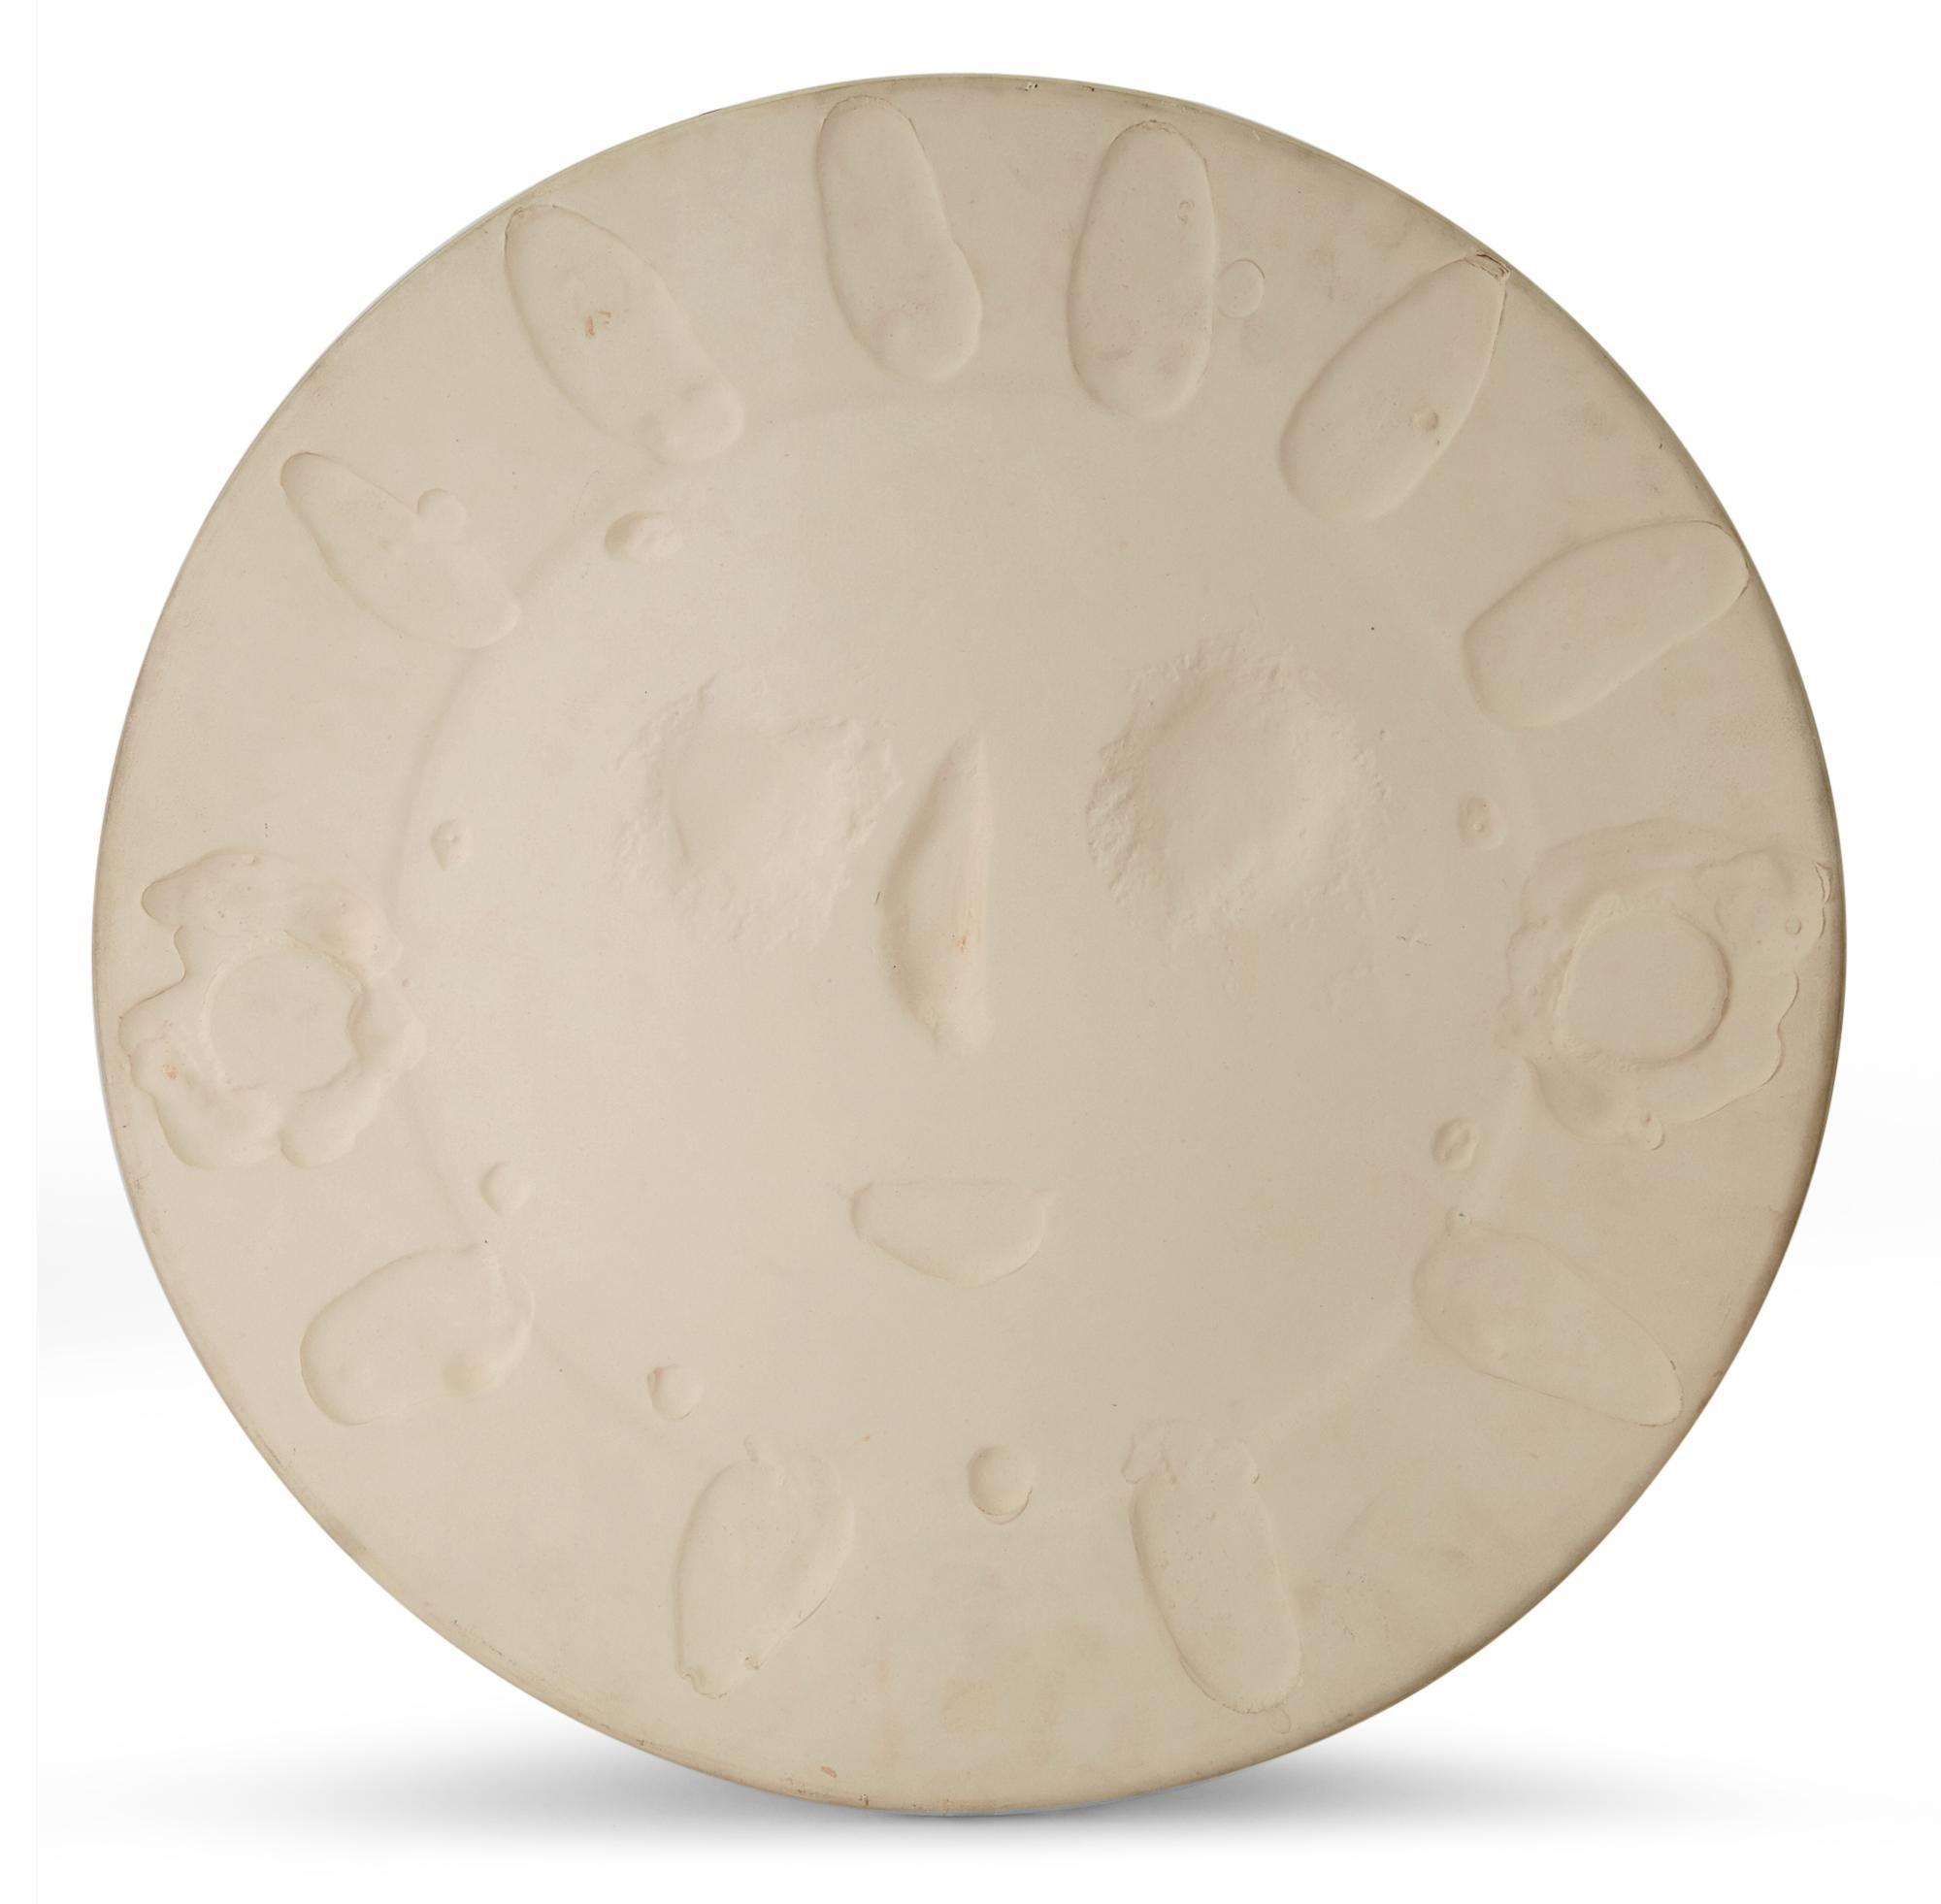 Pablo Picasso Madoura Ceramic Plate 'Visage aux Taches' Ramié 350